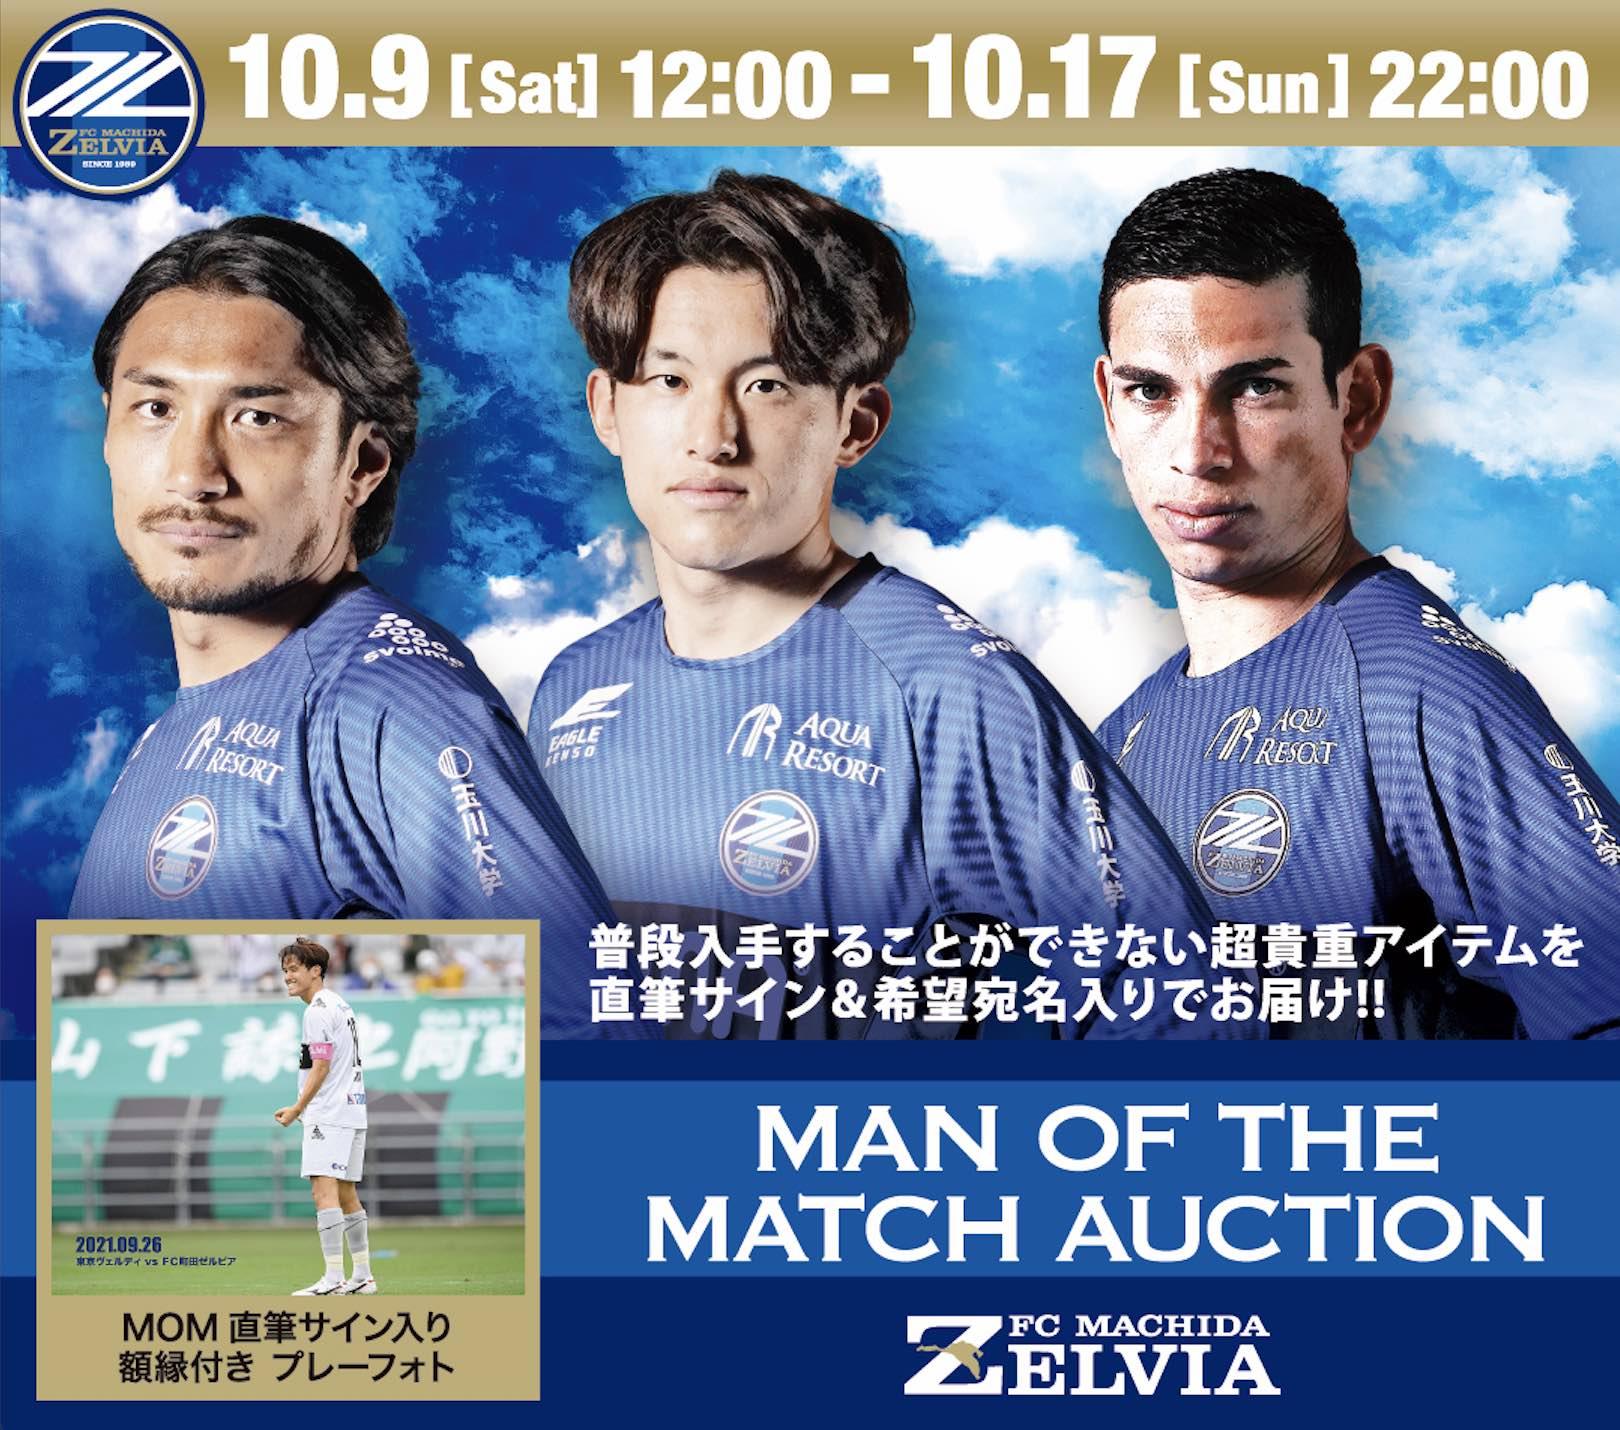 FC町田ゼルビア「マン・オブ・ザ・マッチ」オークション(10月)